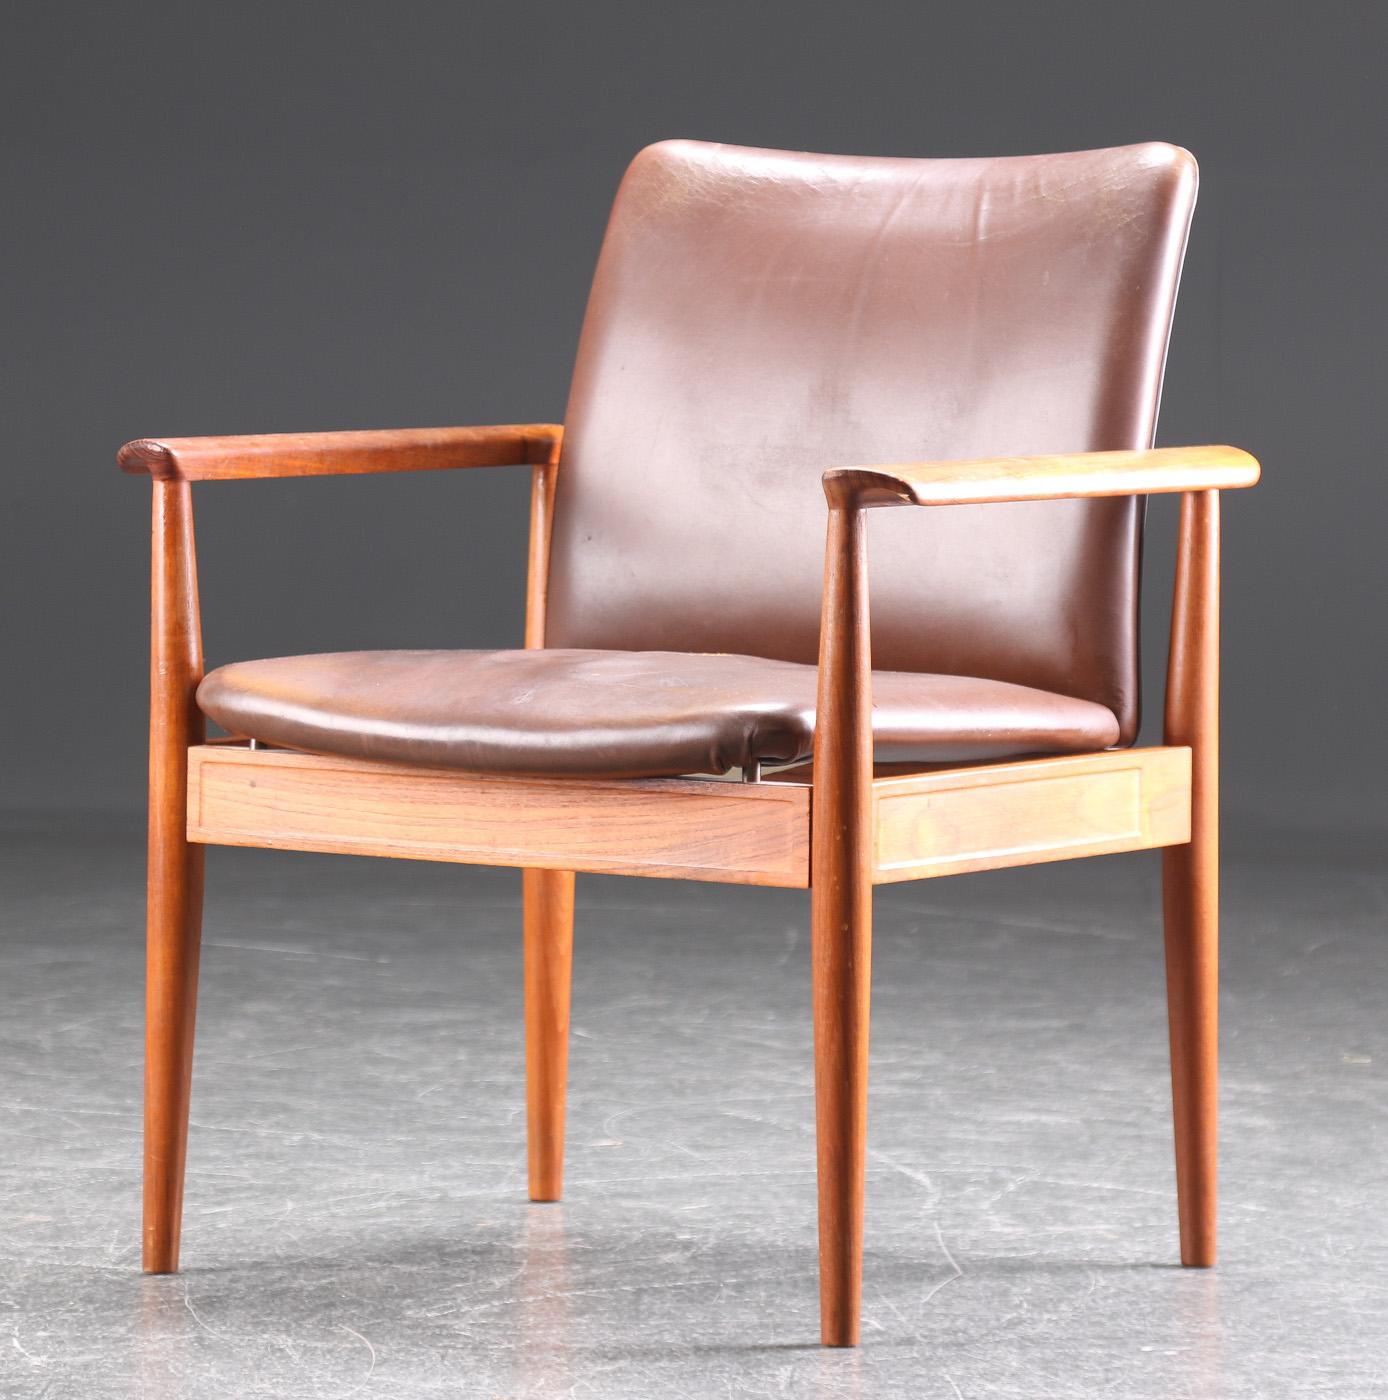 Finn Juhl. Diplomat armchair, teak